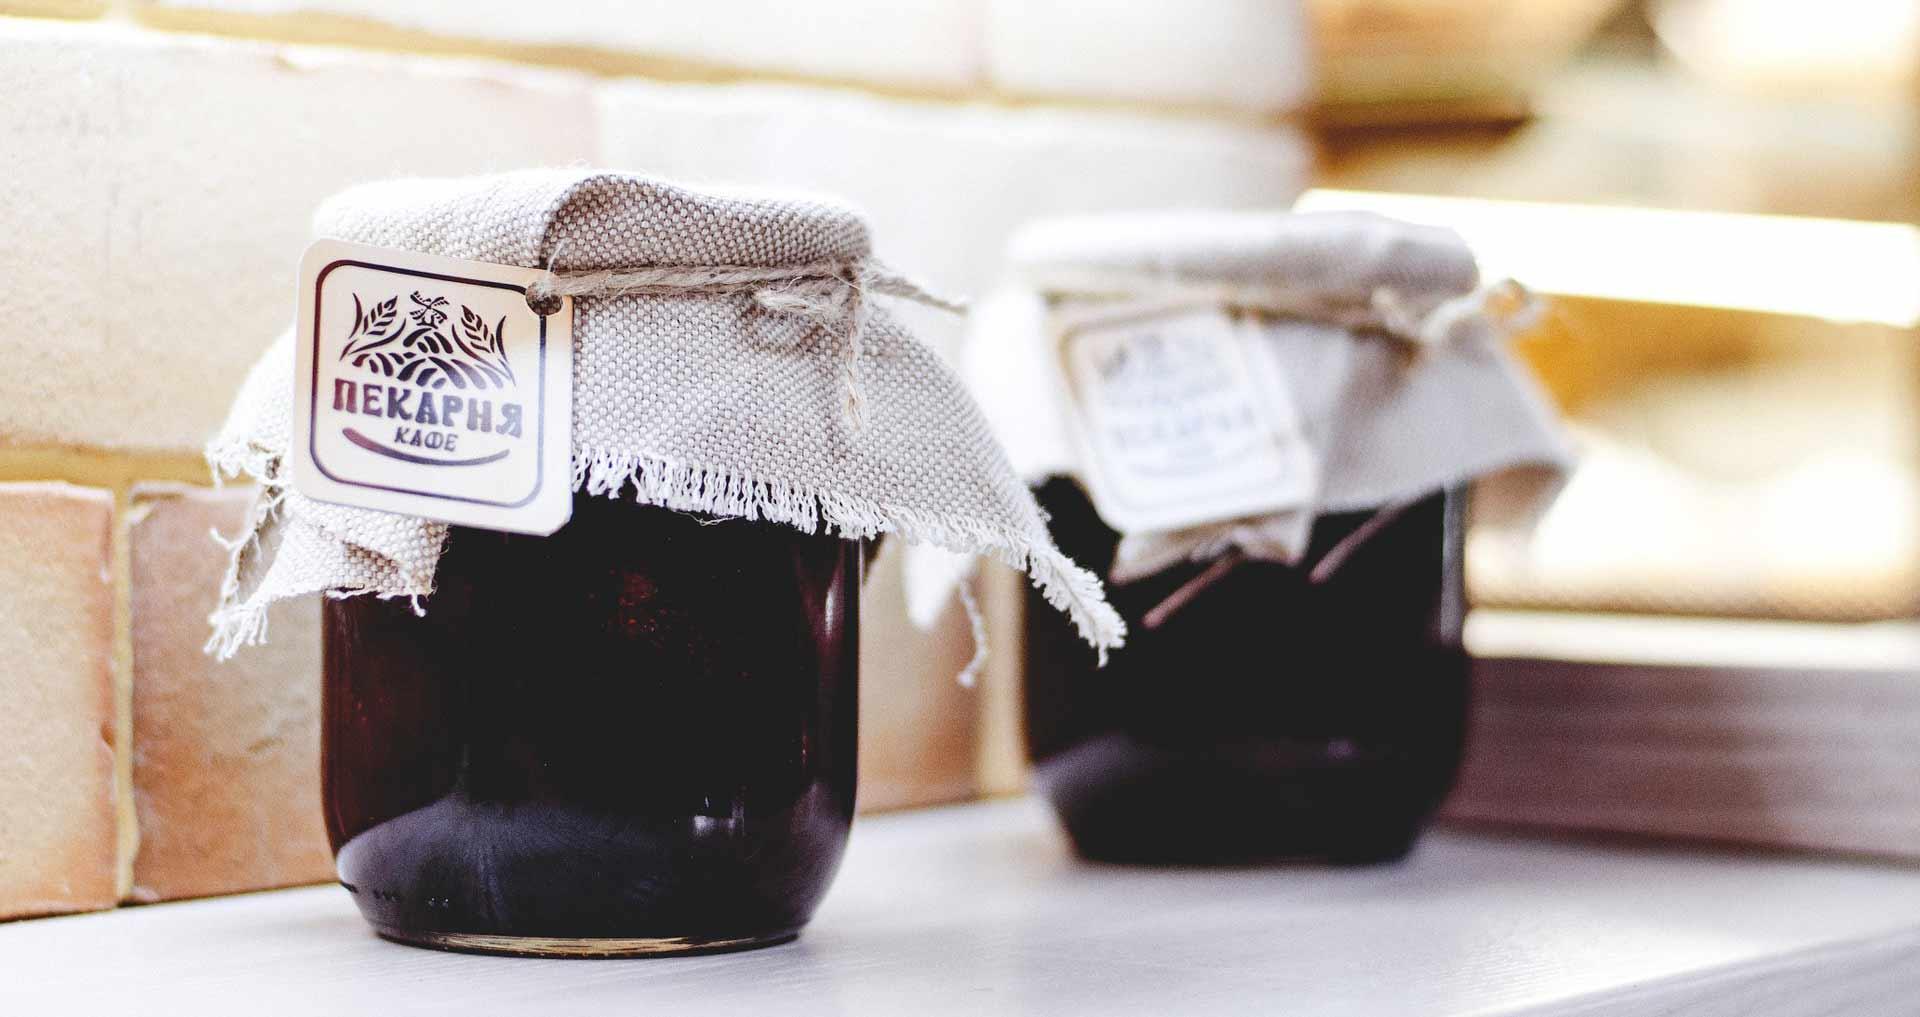 Bien emballer les aliments: les pots en verre